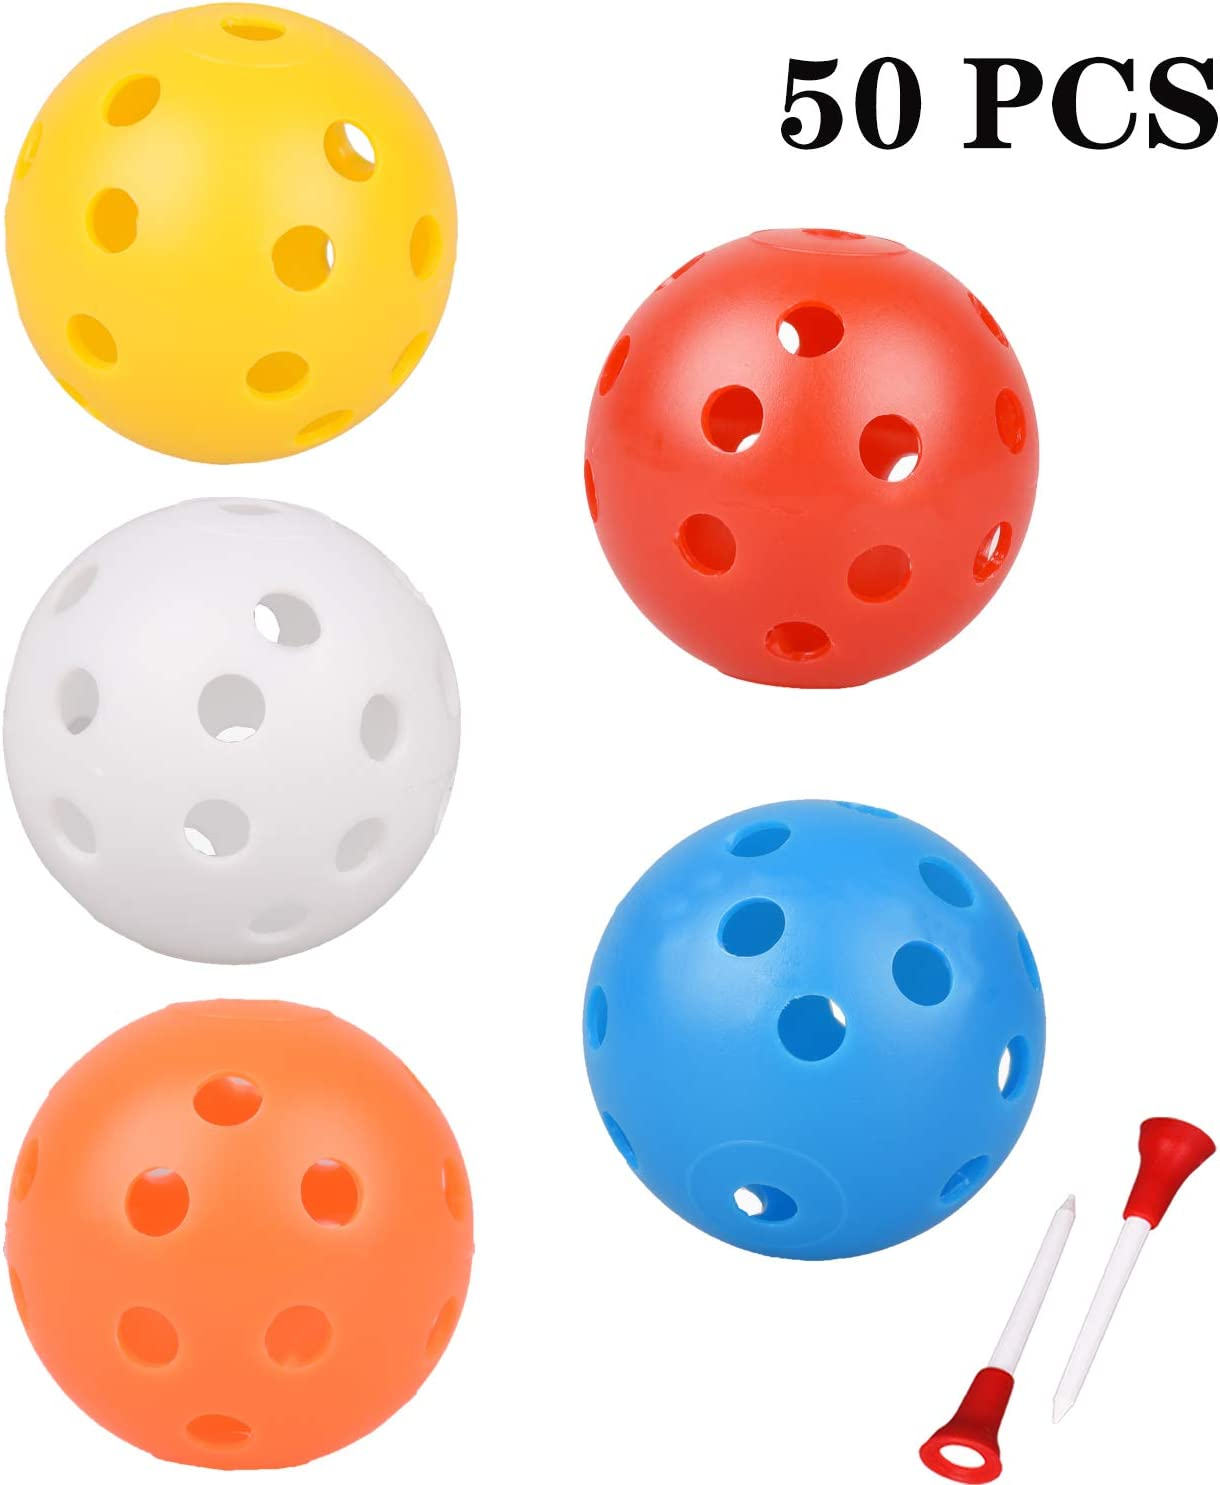 Adwikoso Plastic Golf Training Balls 42 mm Golf Balls for Indoor Putting Green Backyard Outdoor Practice Equipment with 2 Golf Ball Tees